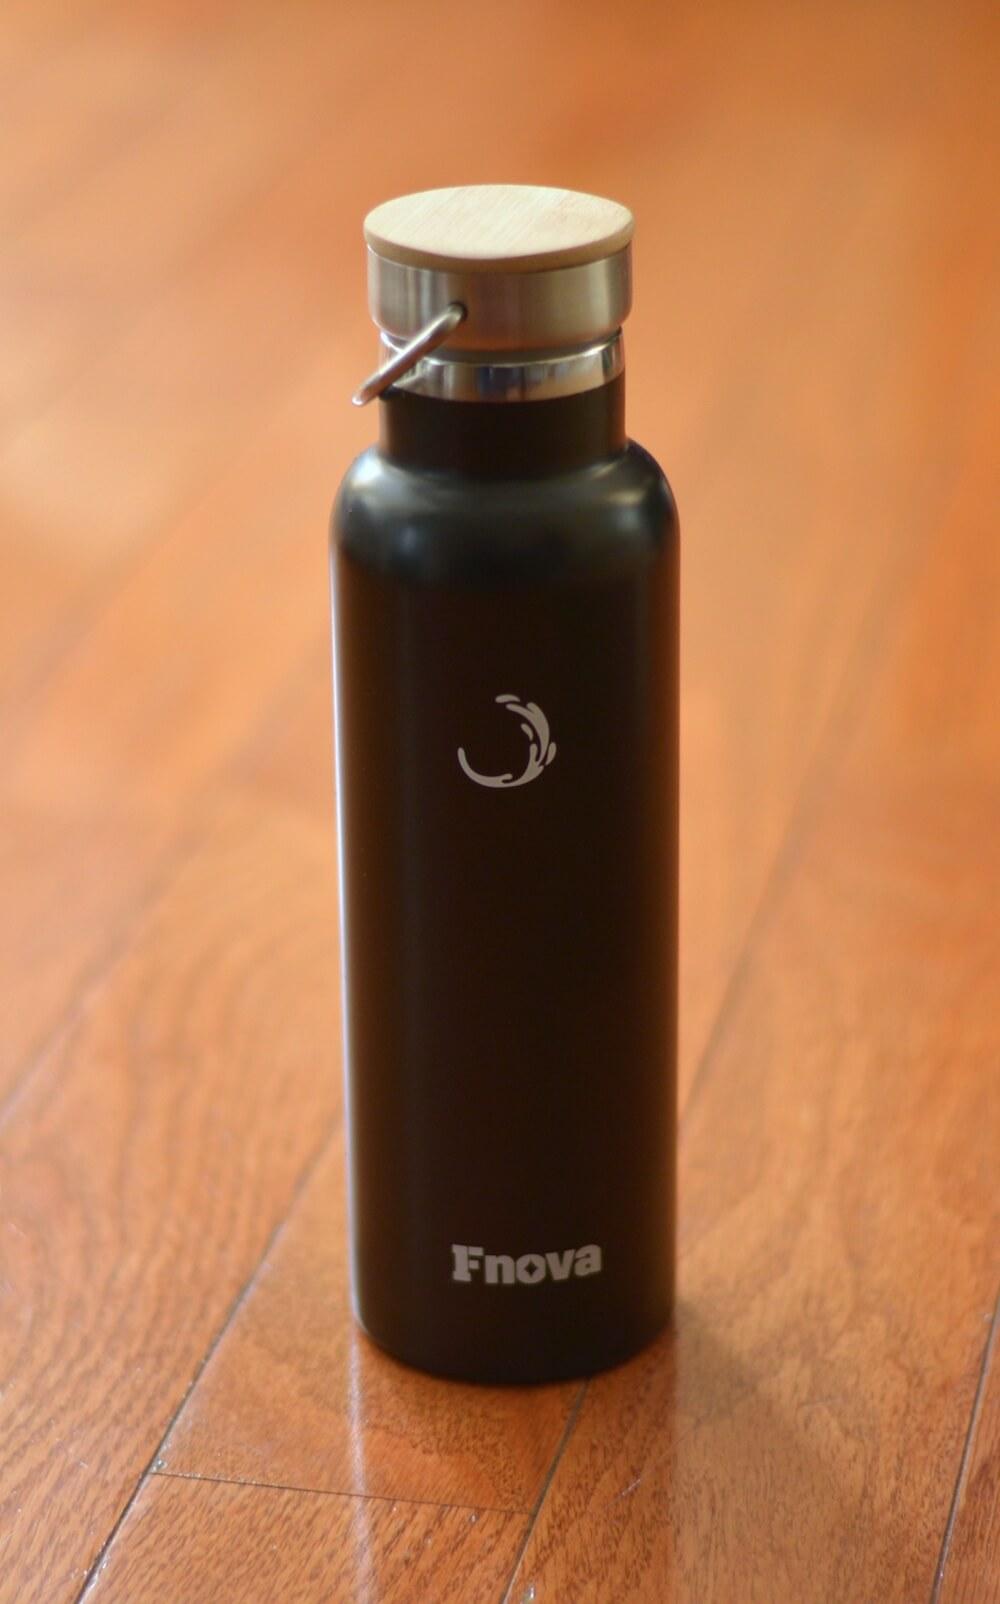 Fnova water bottle review